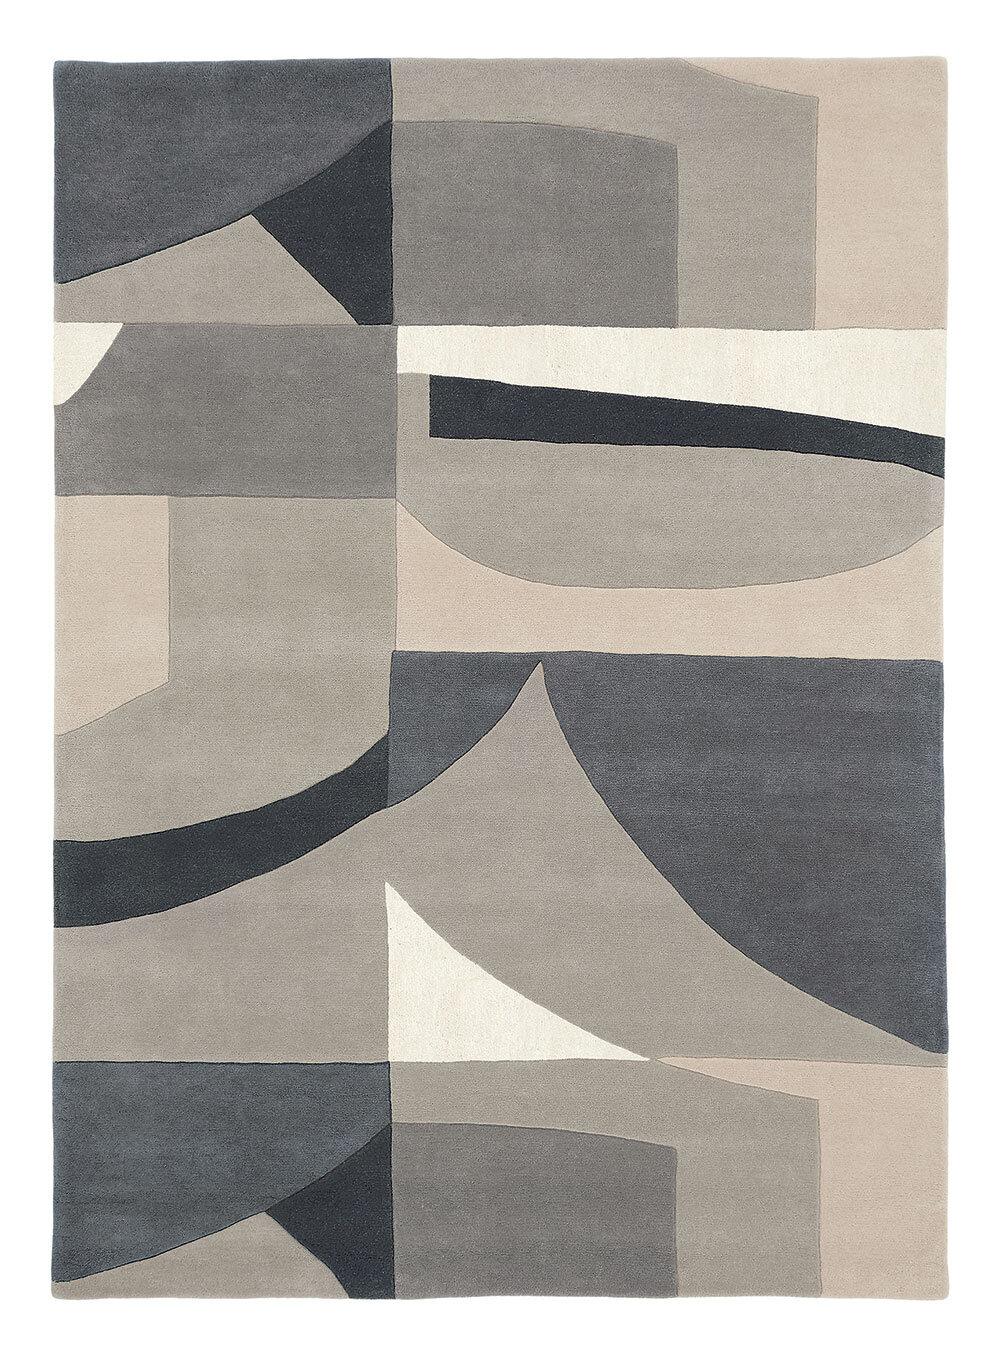 Bodega Rug - Stone - by Harlequin